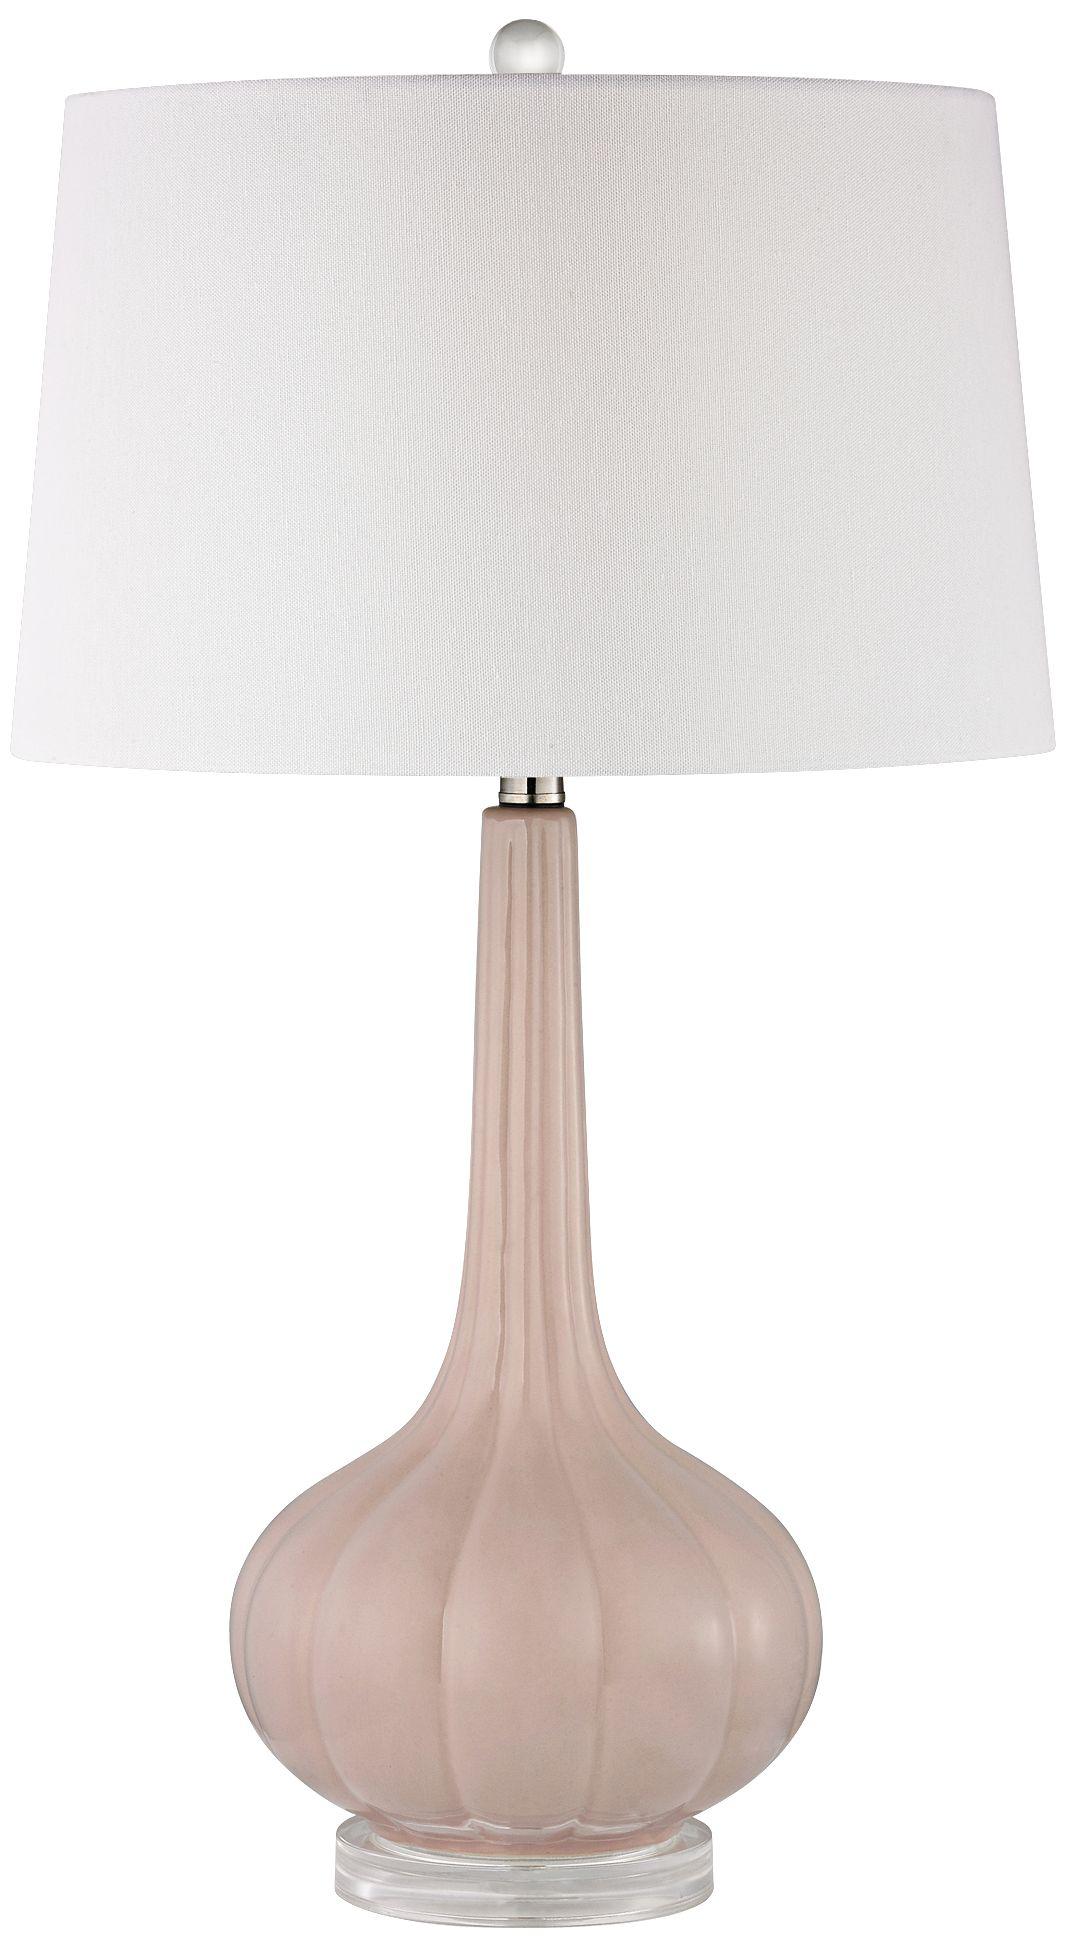 Dimond Abbey Lane Pastel Pink Ceramic Table Lamp